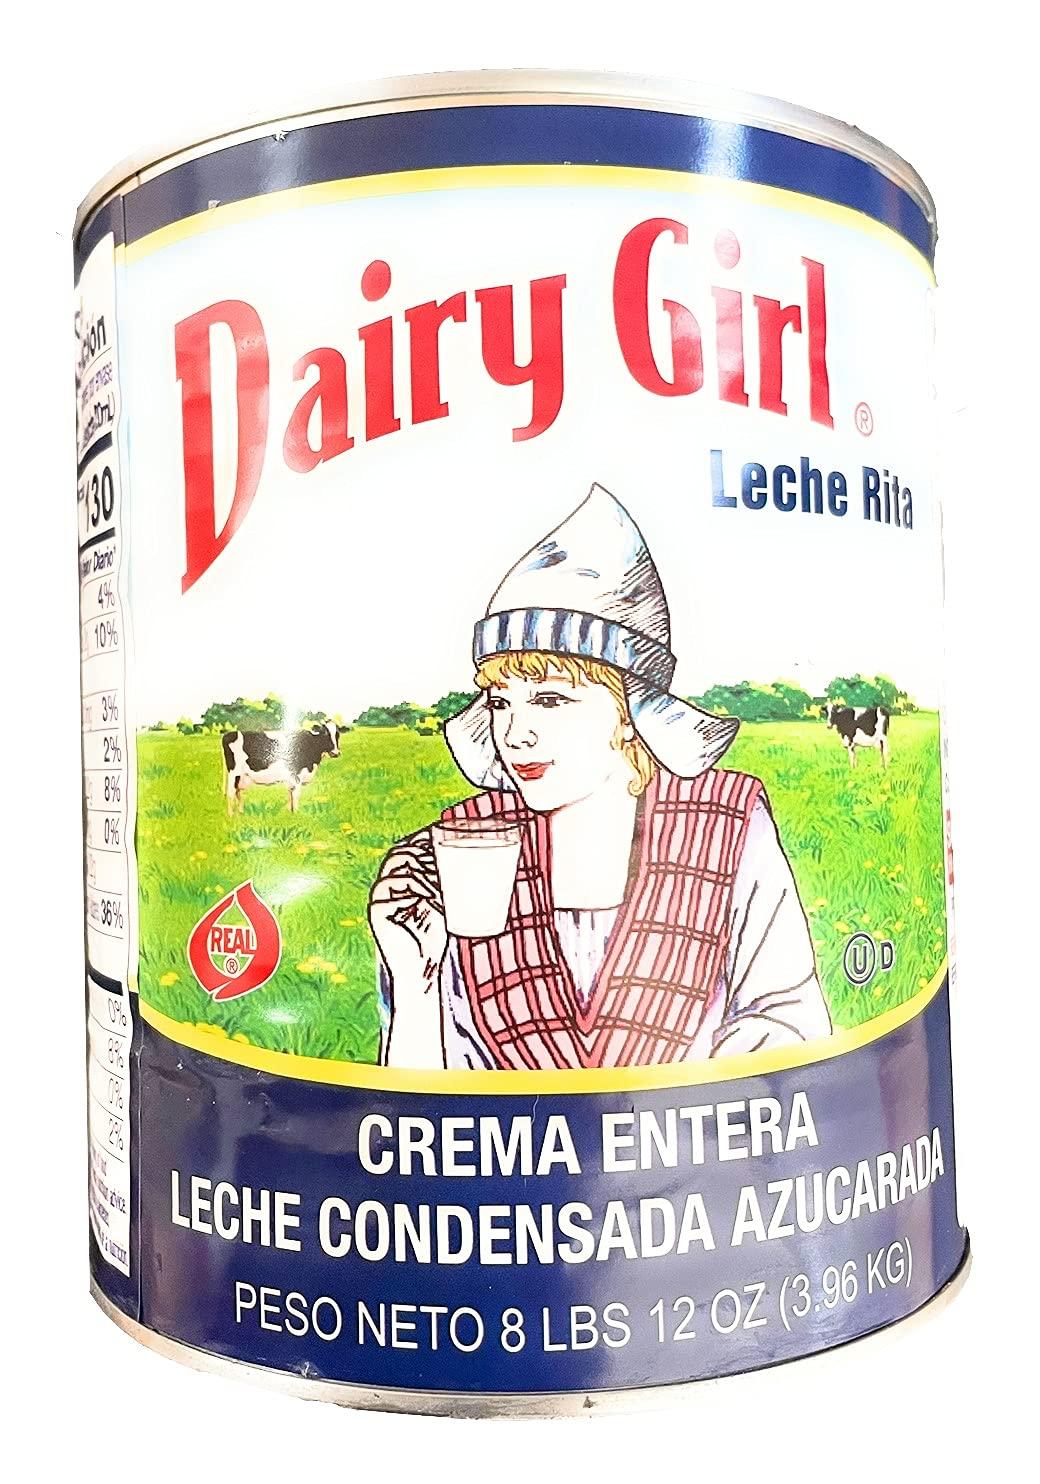 Dairy Girl Full Cream Sweetened Condensed Milk 8lbs12oz 140oz Popular standard Max 44% OFF